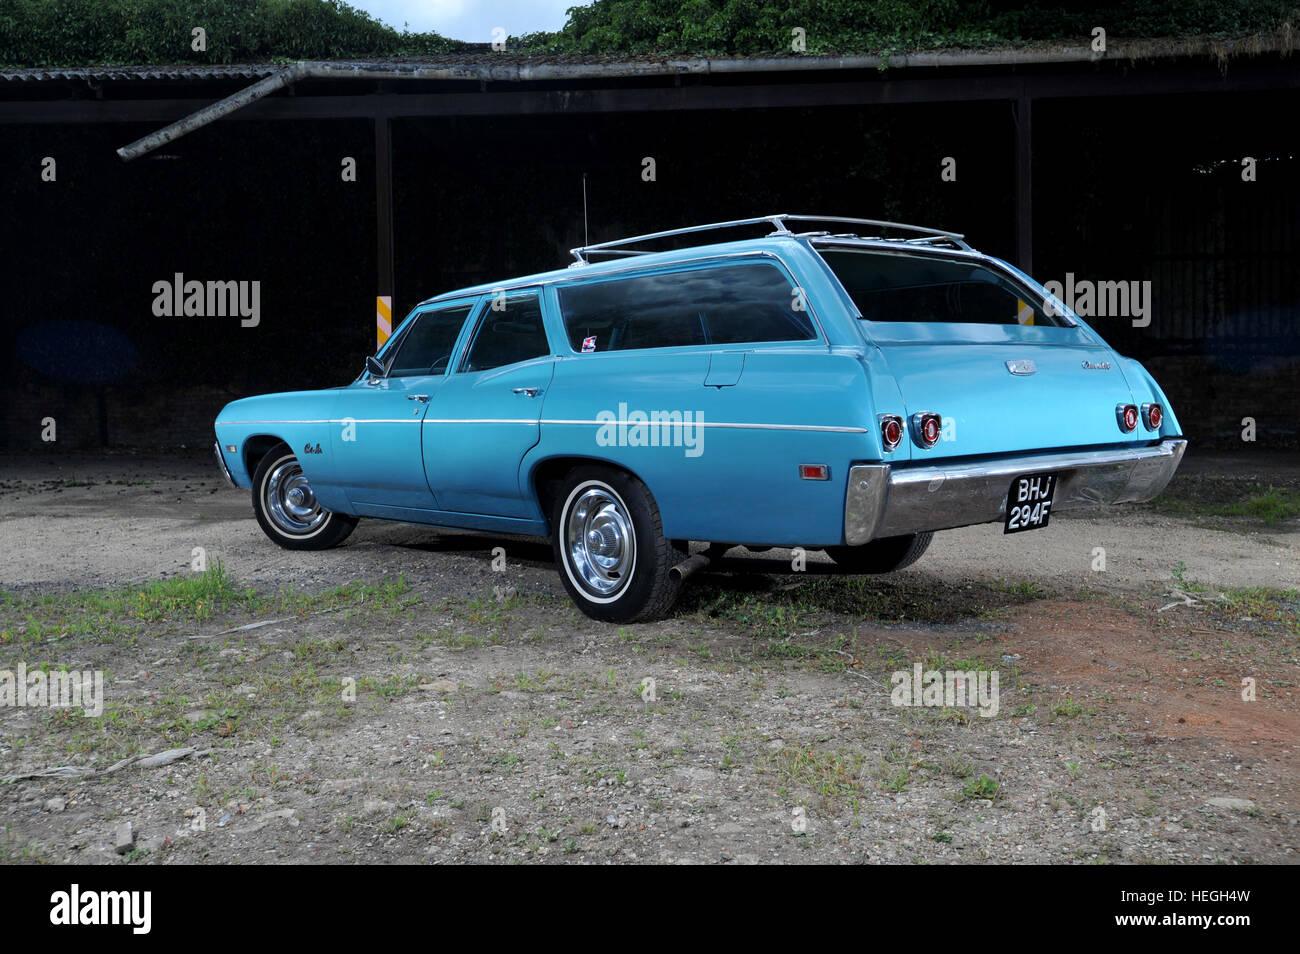 1967 Chevrolet Bel Air Station Wagon Classic American Car